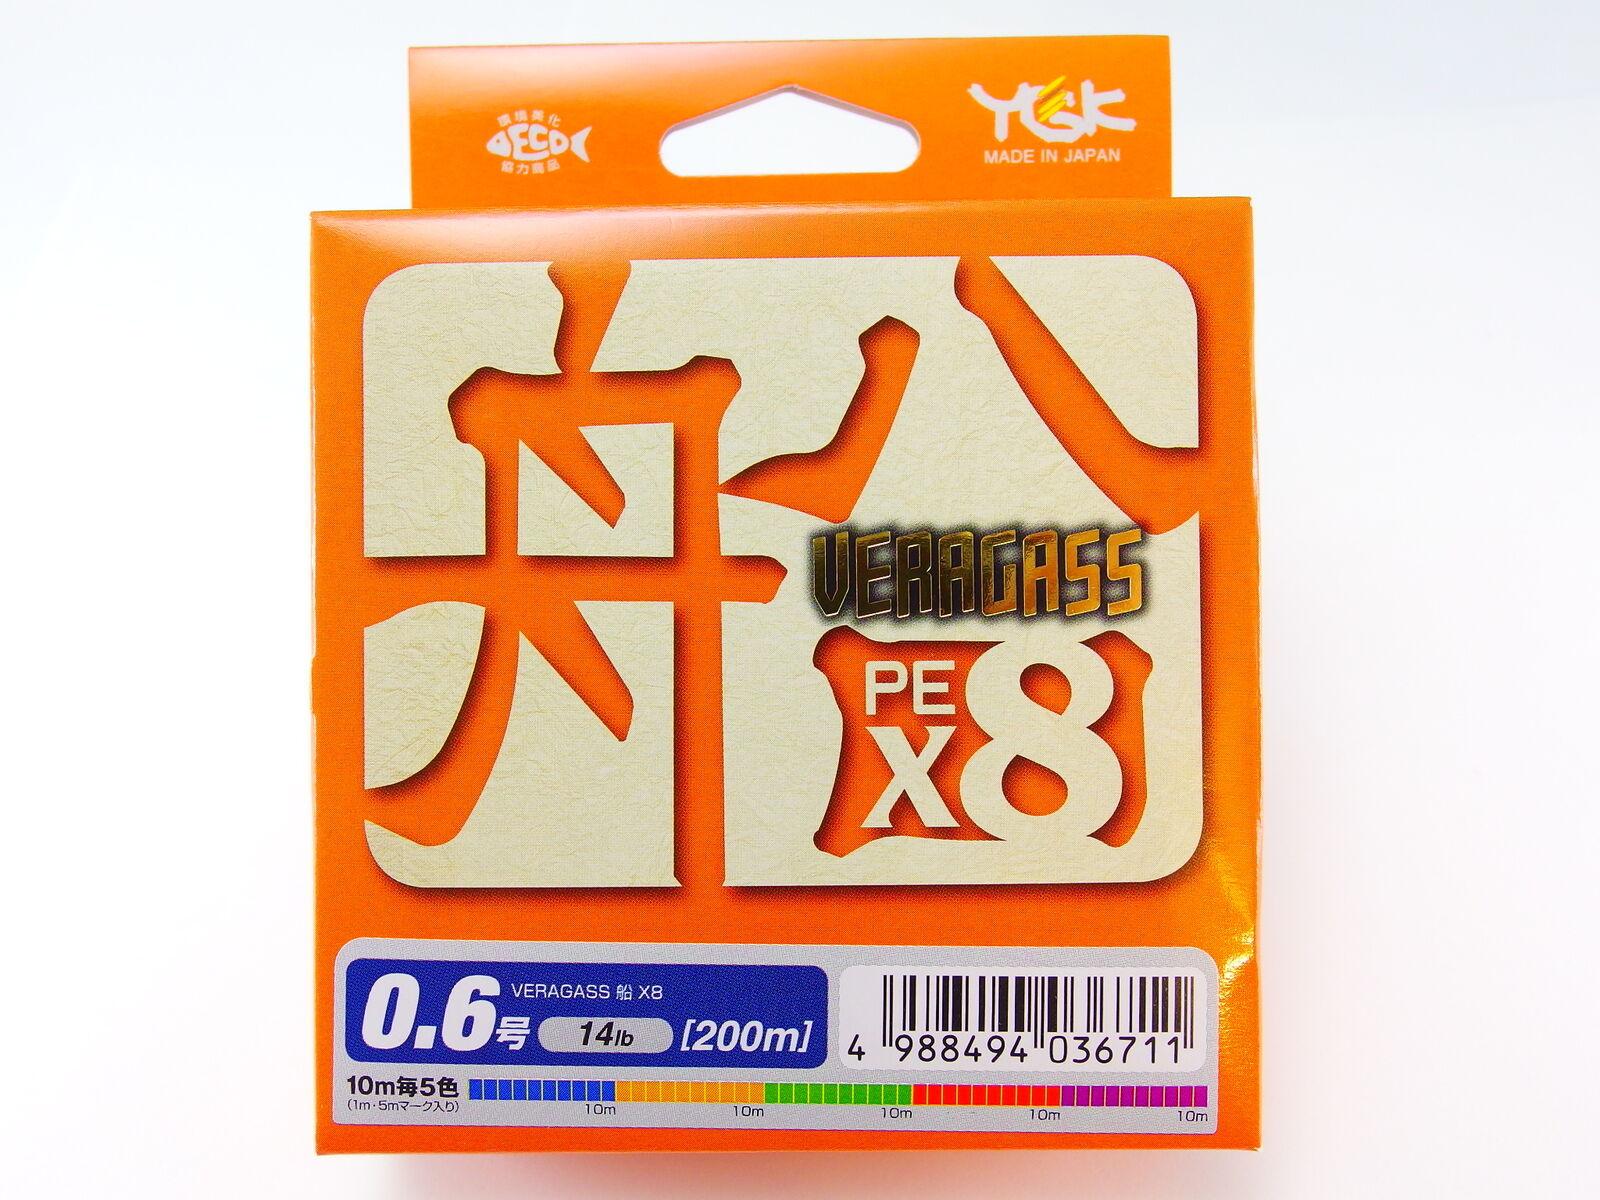 YGK - VARAGASS FUNE (BOAT) PE X8 Hi-Quality WX Dyneema 200m  0.6 14lb  | Zuverlässige Qualität